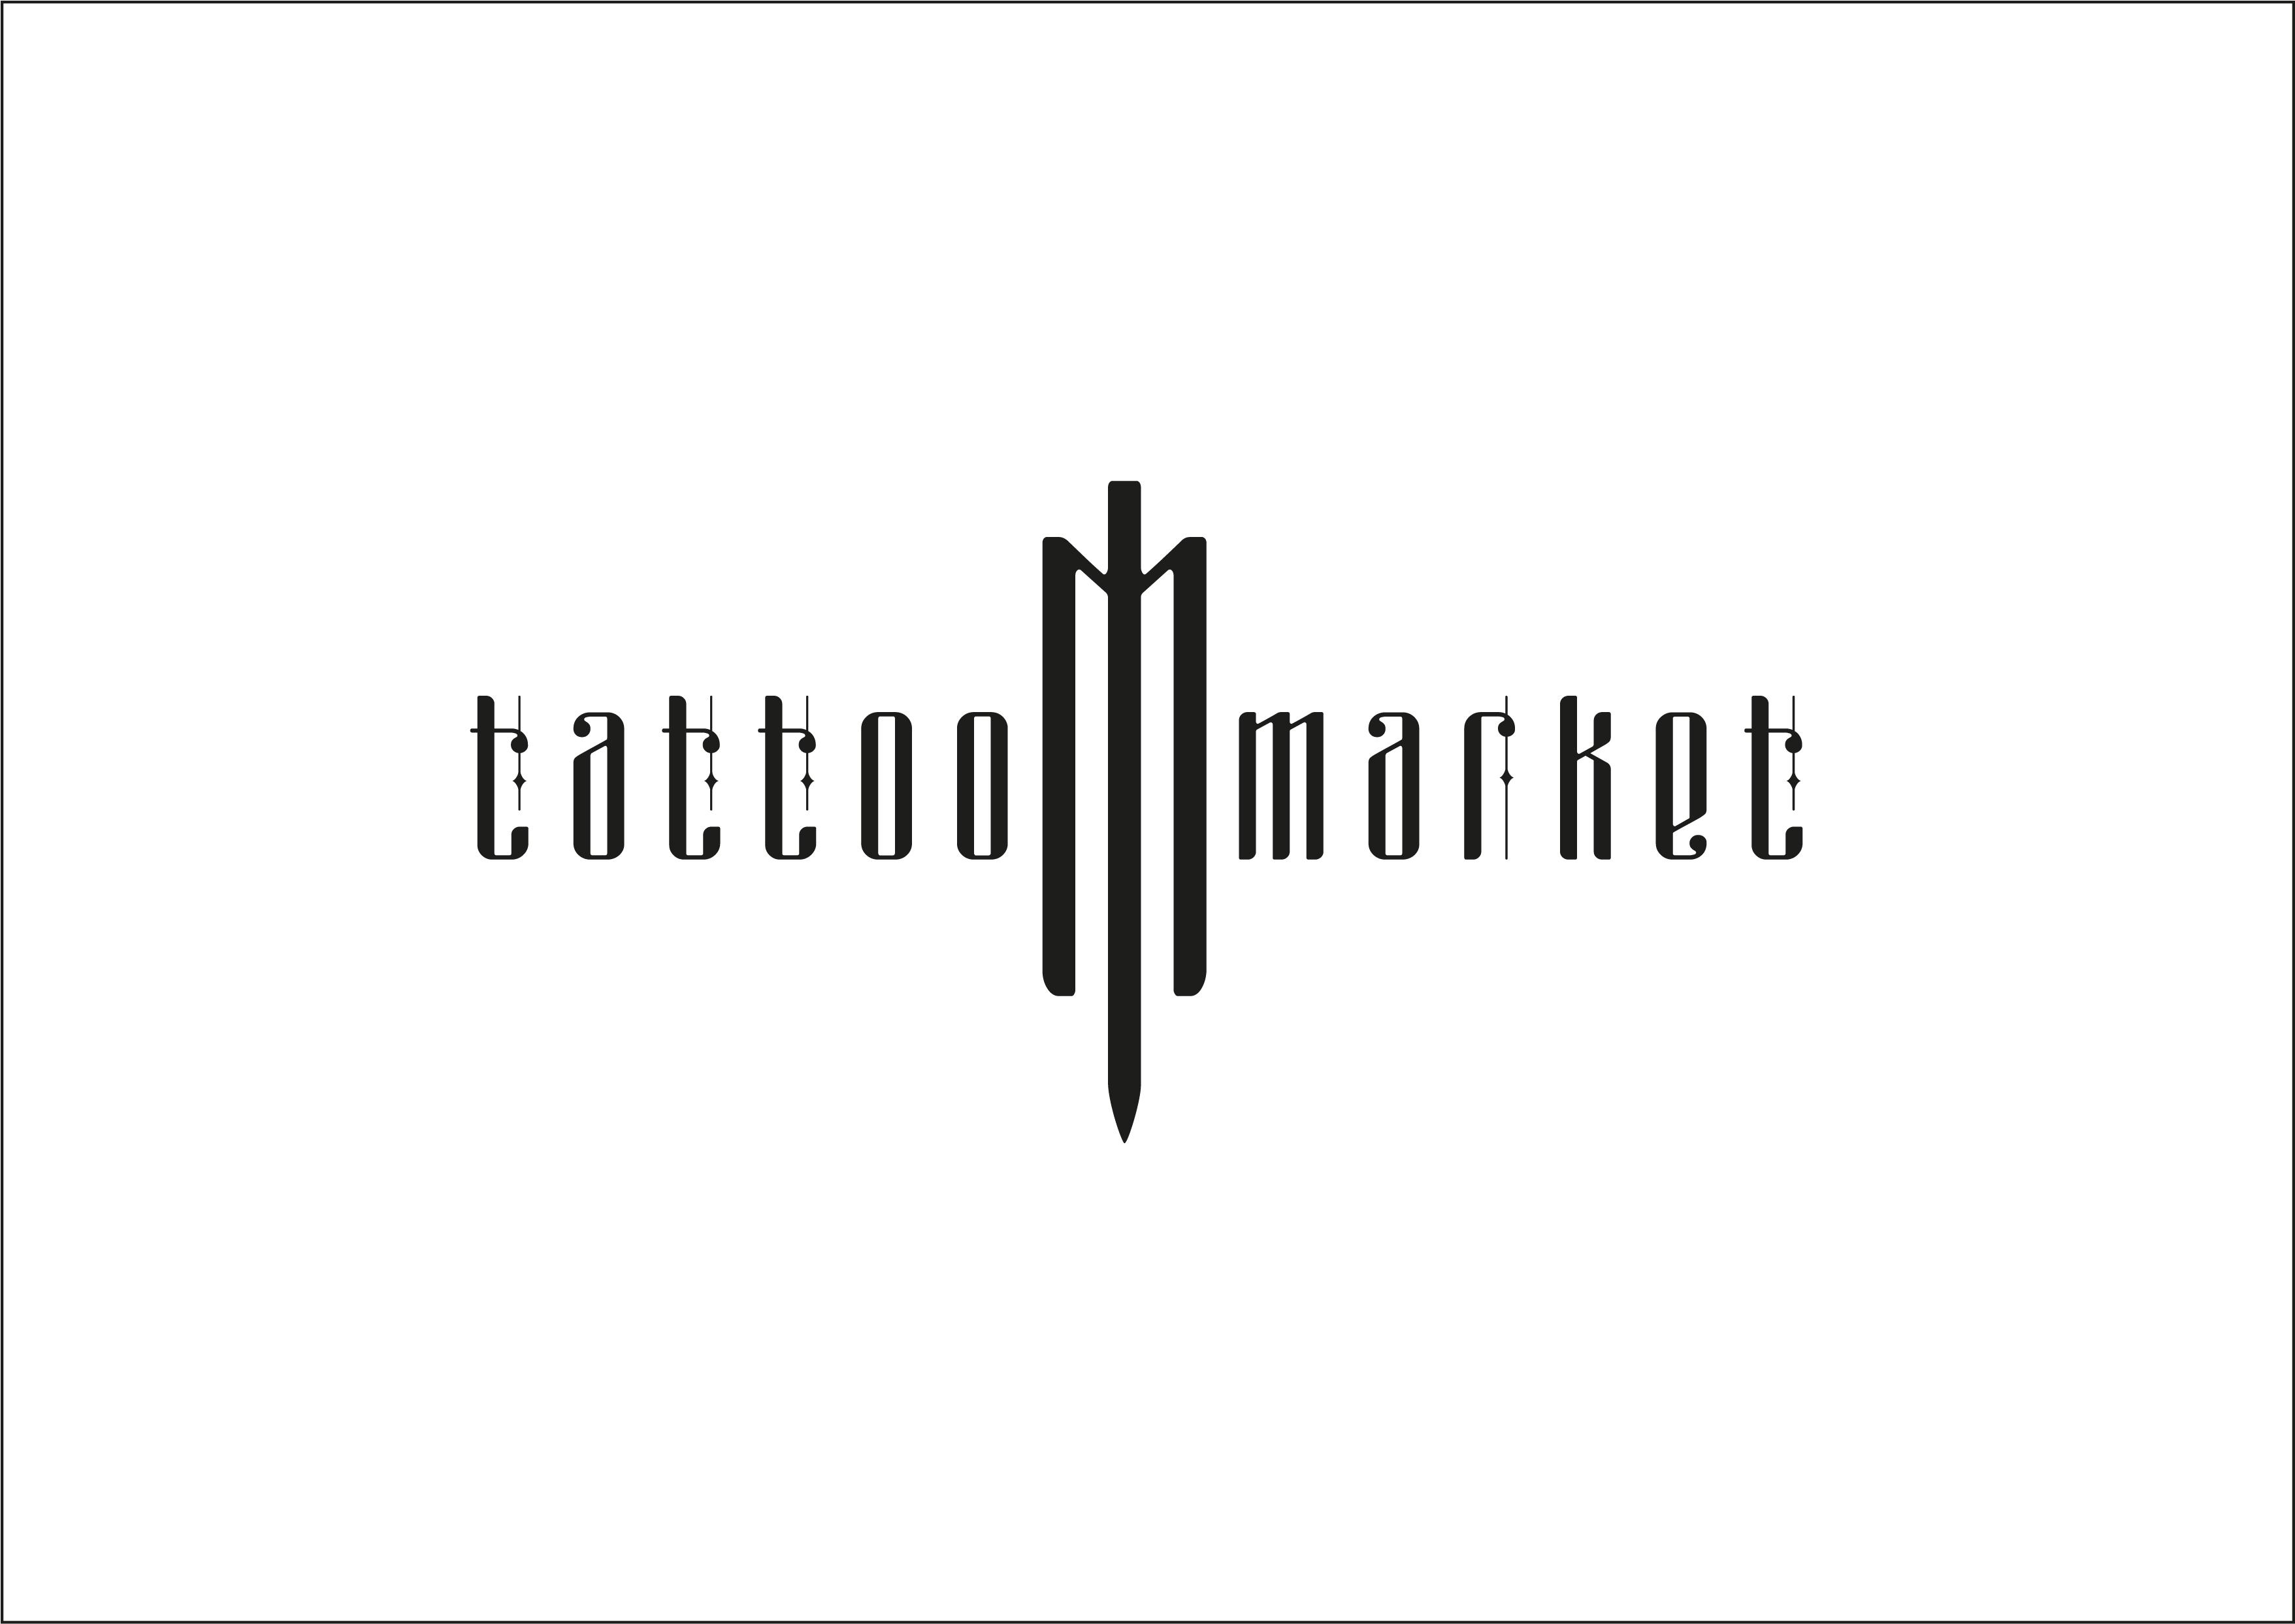 Редизайн логотипа магазина тату оборудования TattooMarket.ru фото f_4895c51c8013737b.jpg